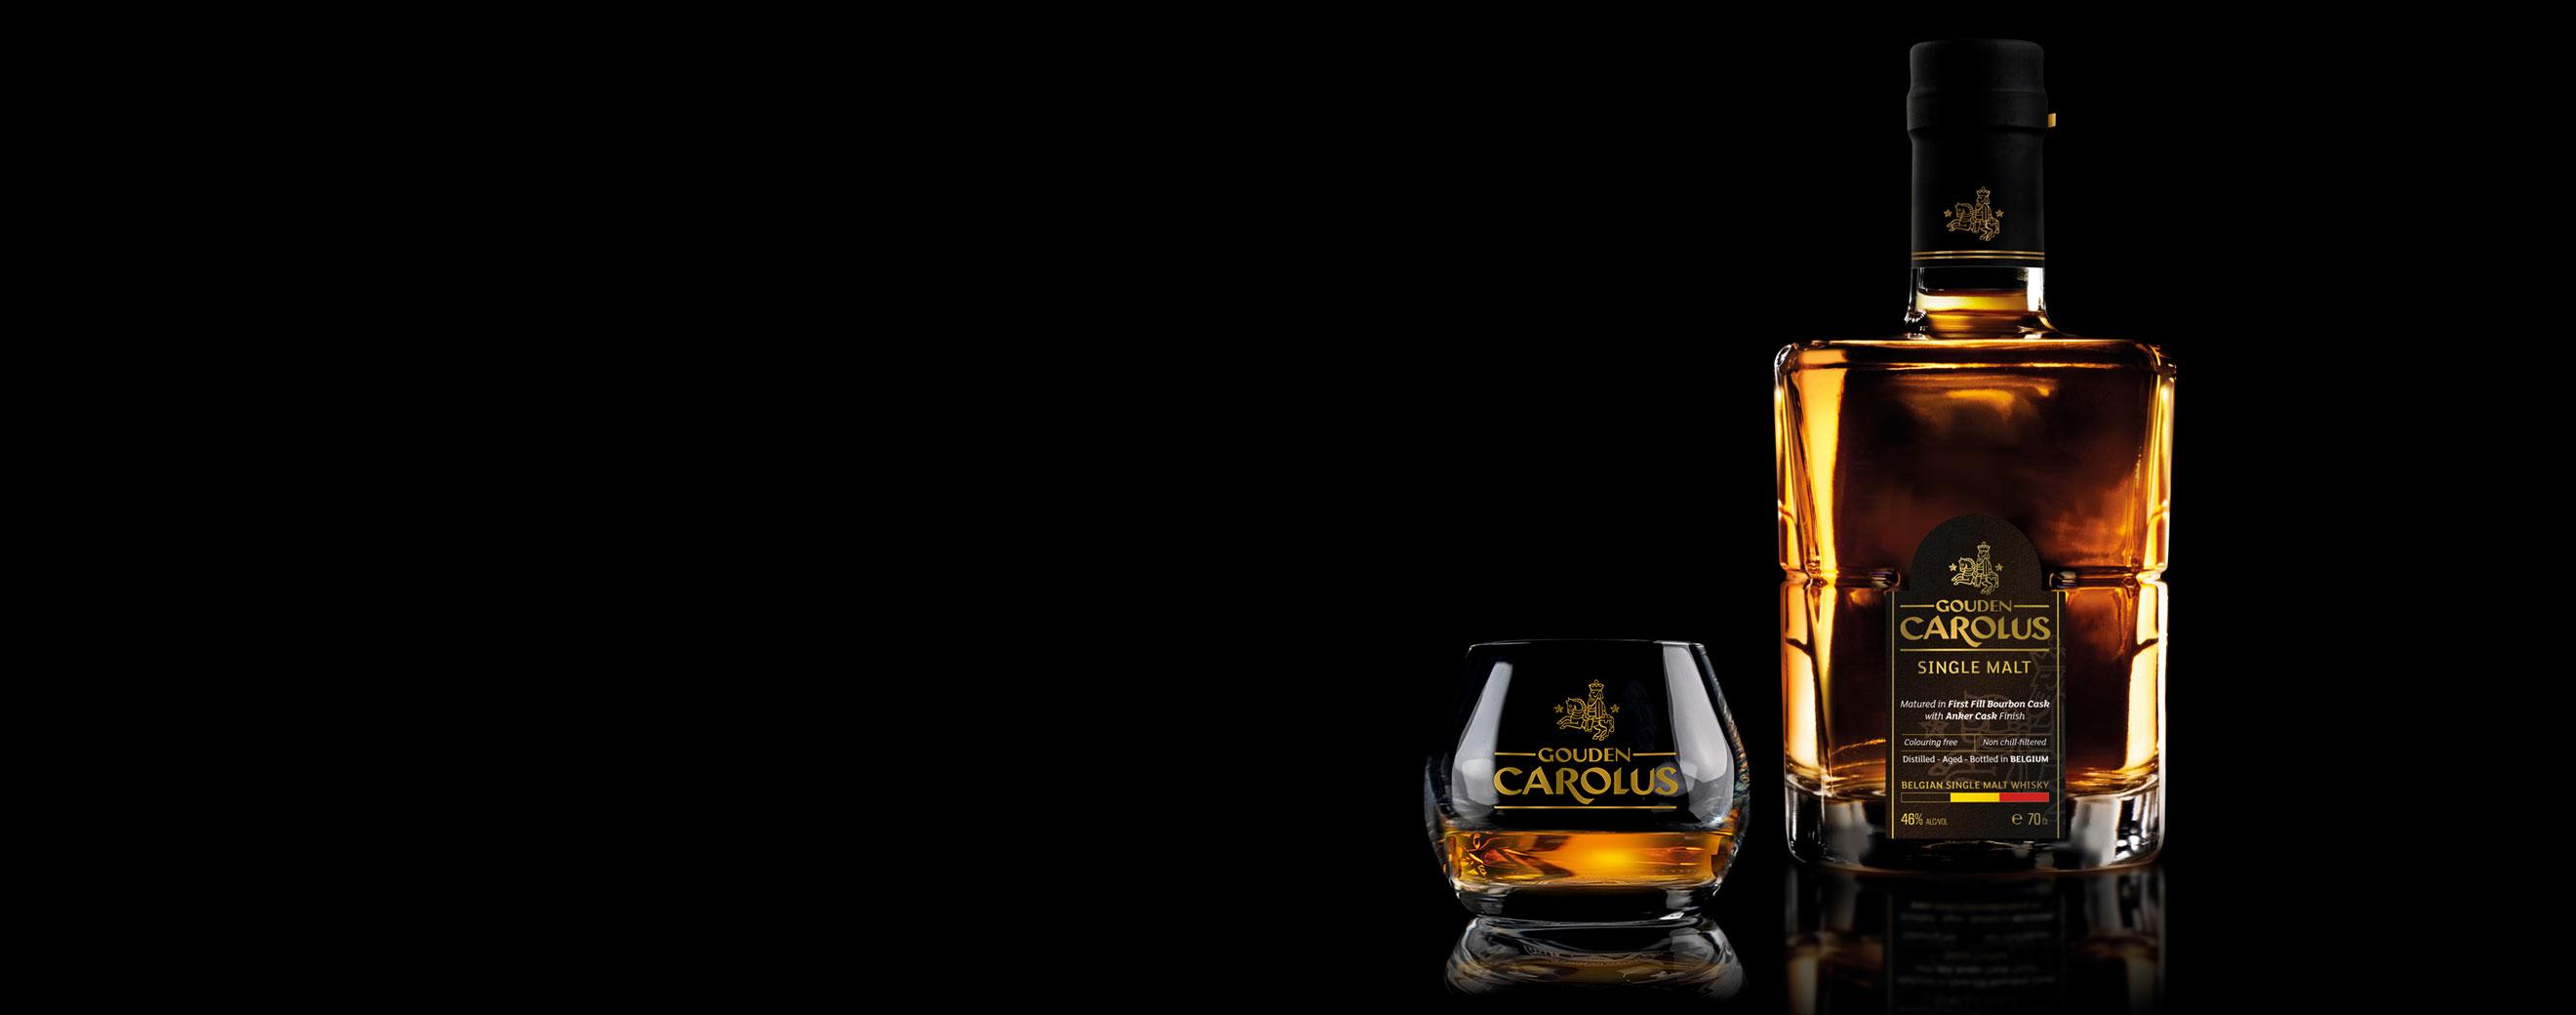 Gouden Carolus Single Malt Whisky Stokerij De Molenberg met glas